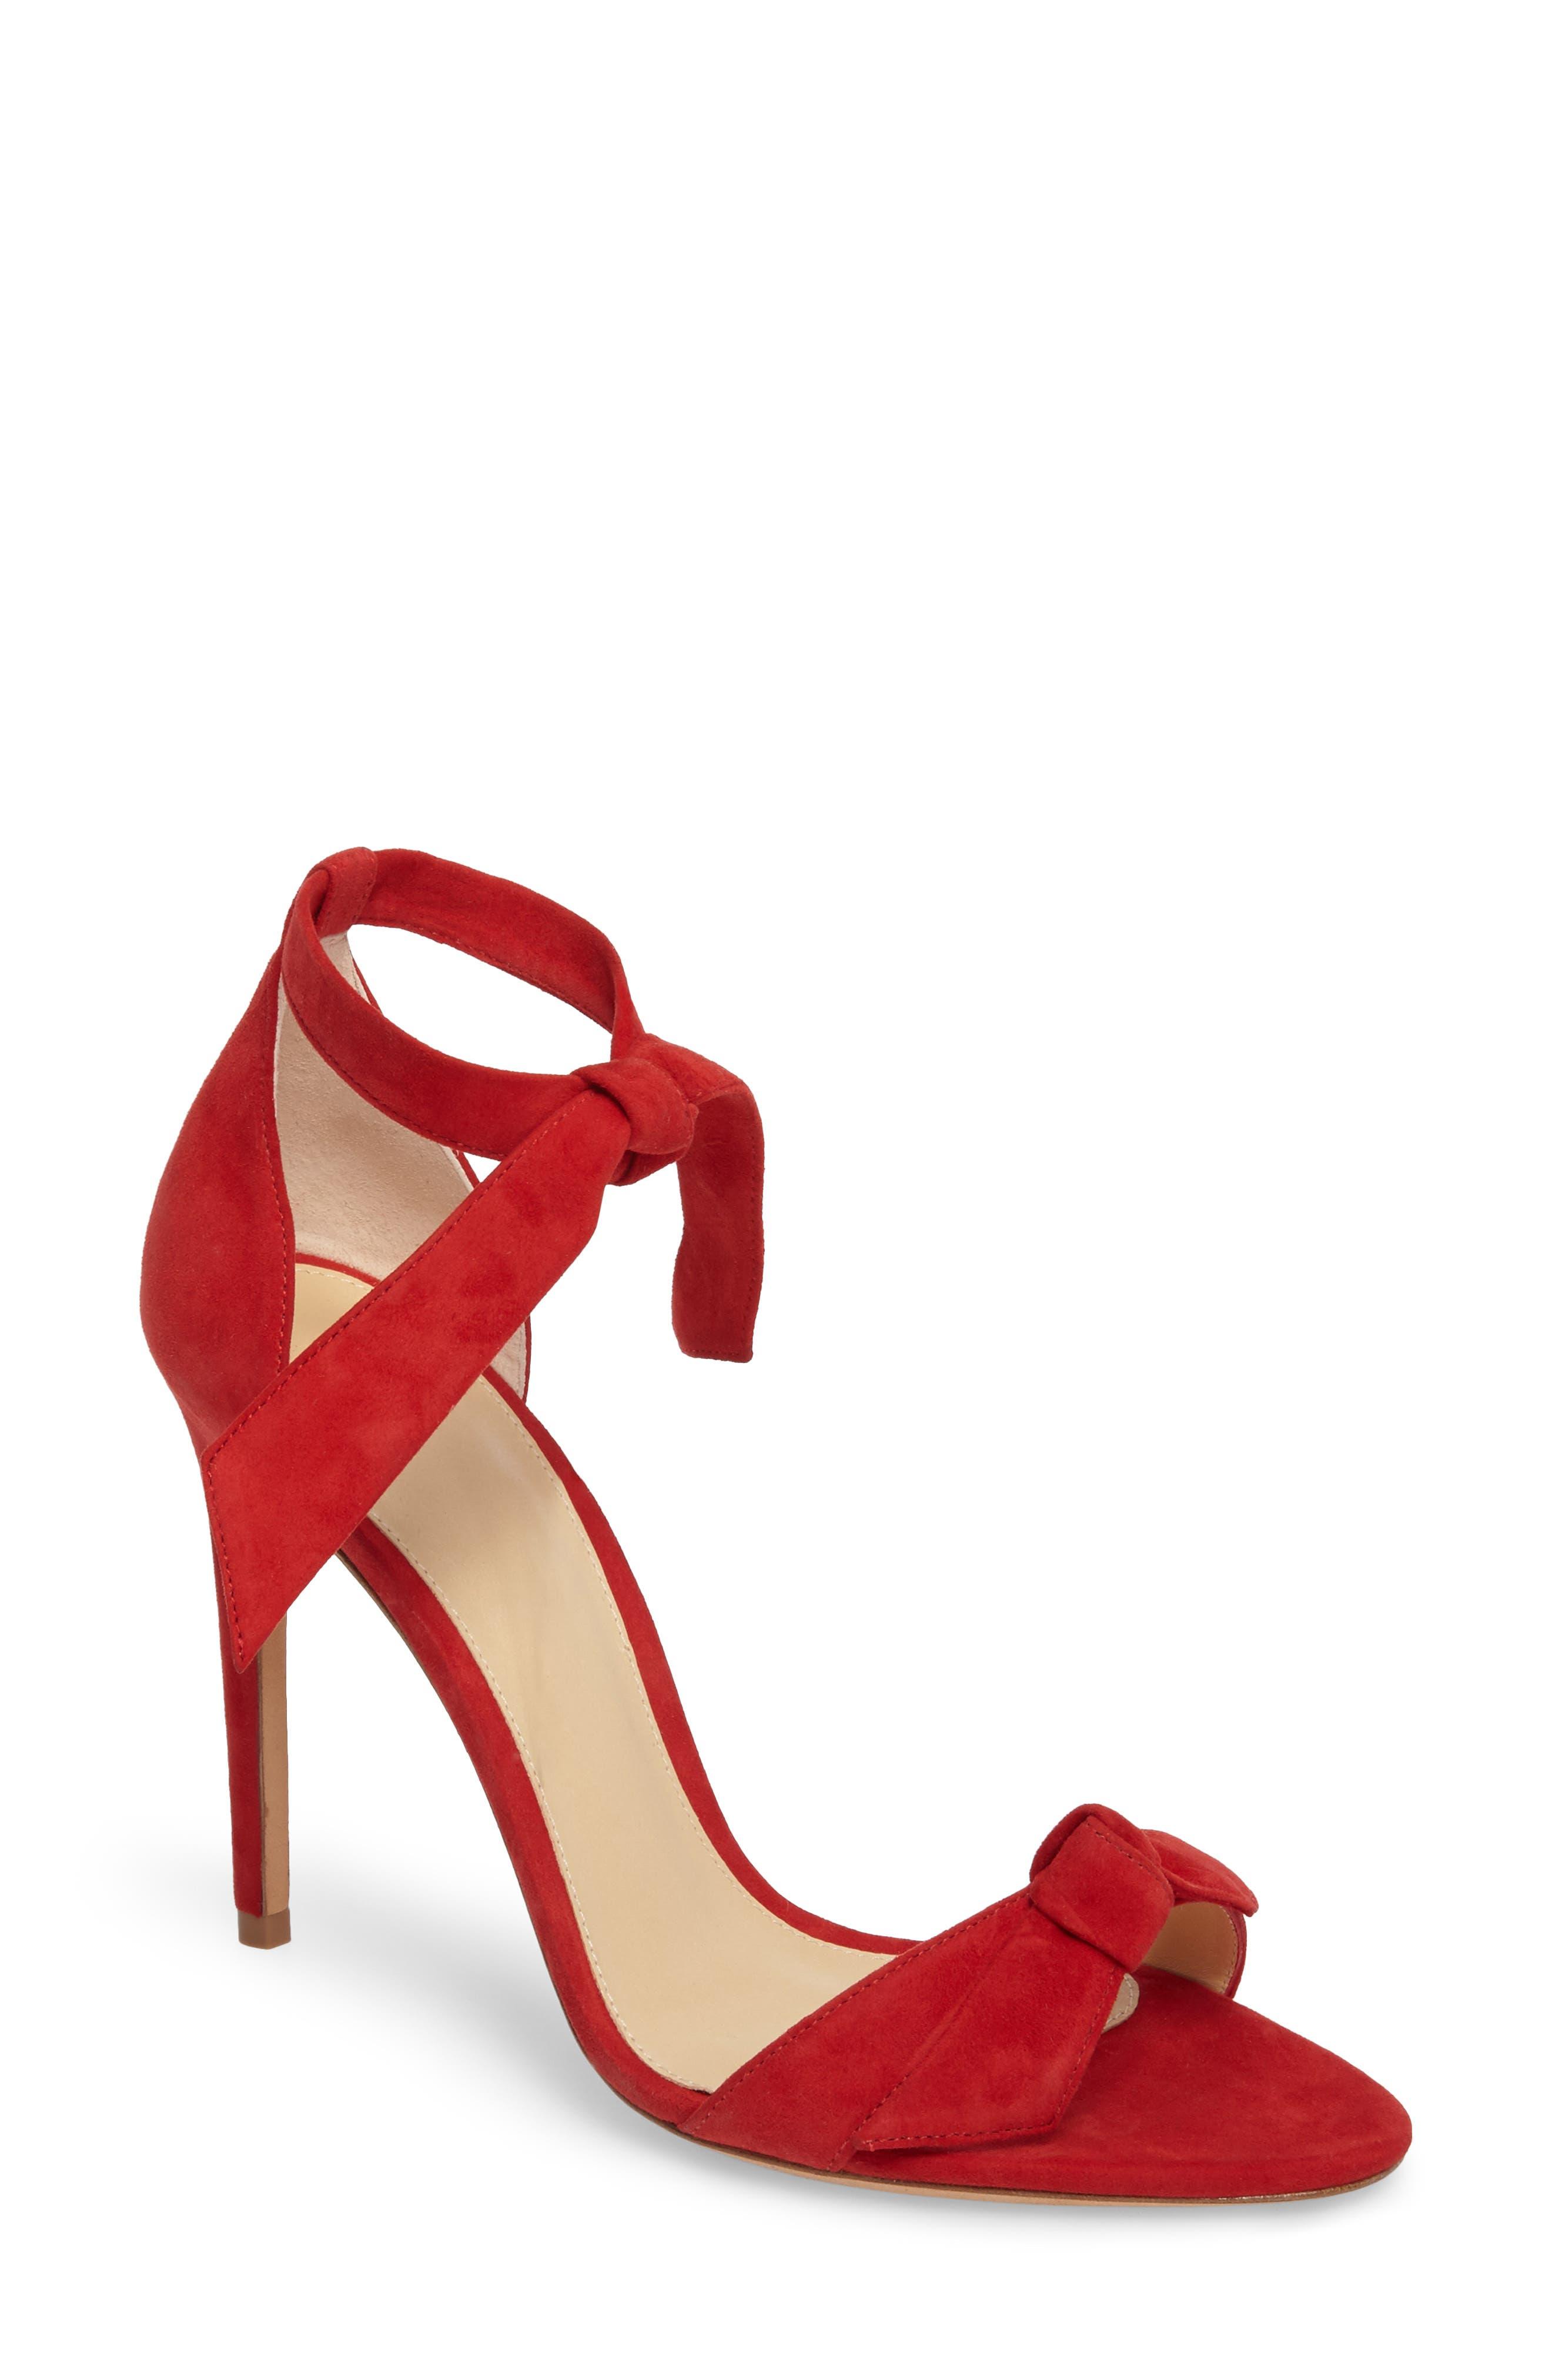 'Clarita' Ankle Tie Sandal,                         Main,                         color, FLAME SUEDE